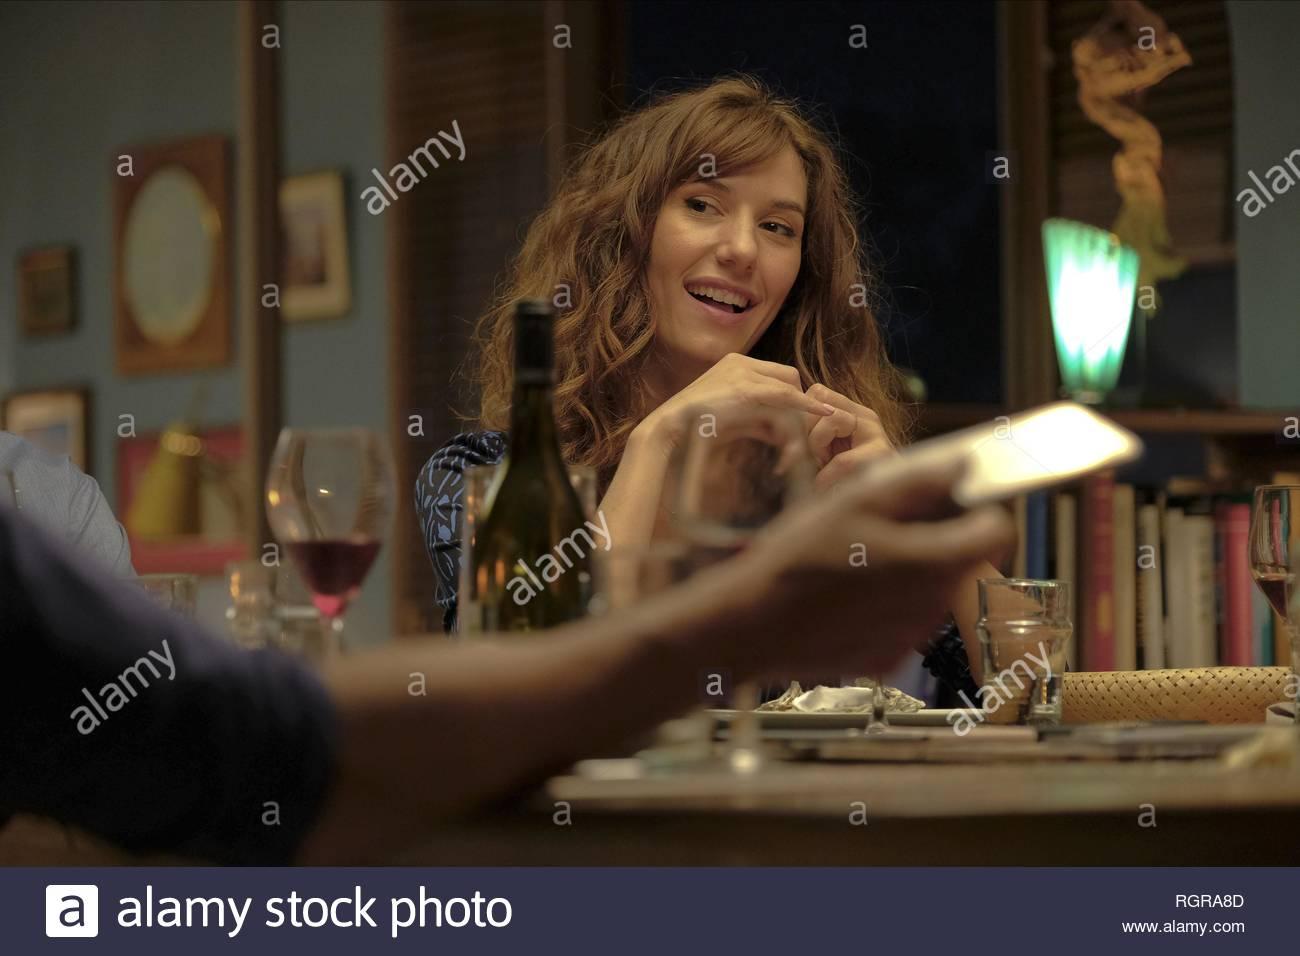 DORIA TILLIER LE JEU; NOTHING TO HIDE (2018) - Stock Image